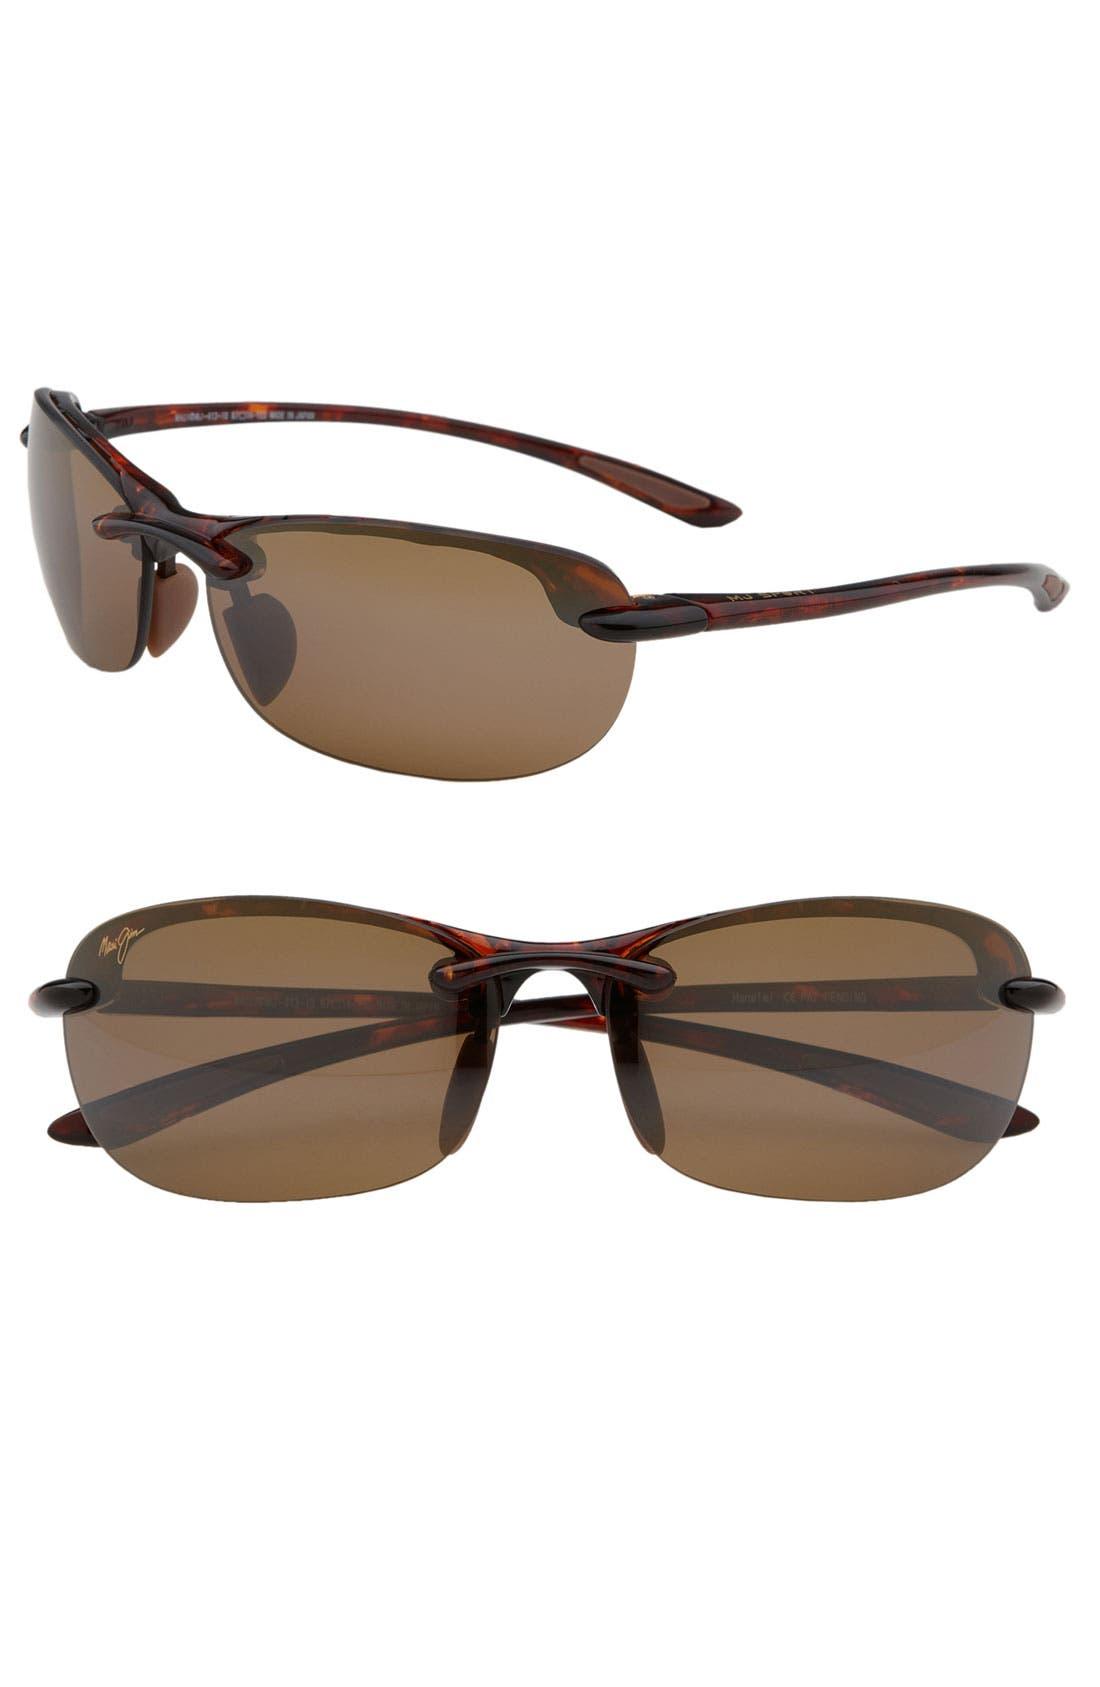 Alternate Image 1 Selected - Maui Jim Hanalei 64mm PolarizedPlus2® Rimless Sunglasses